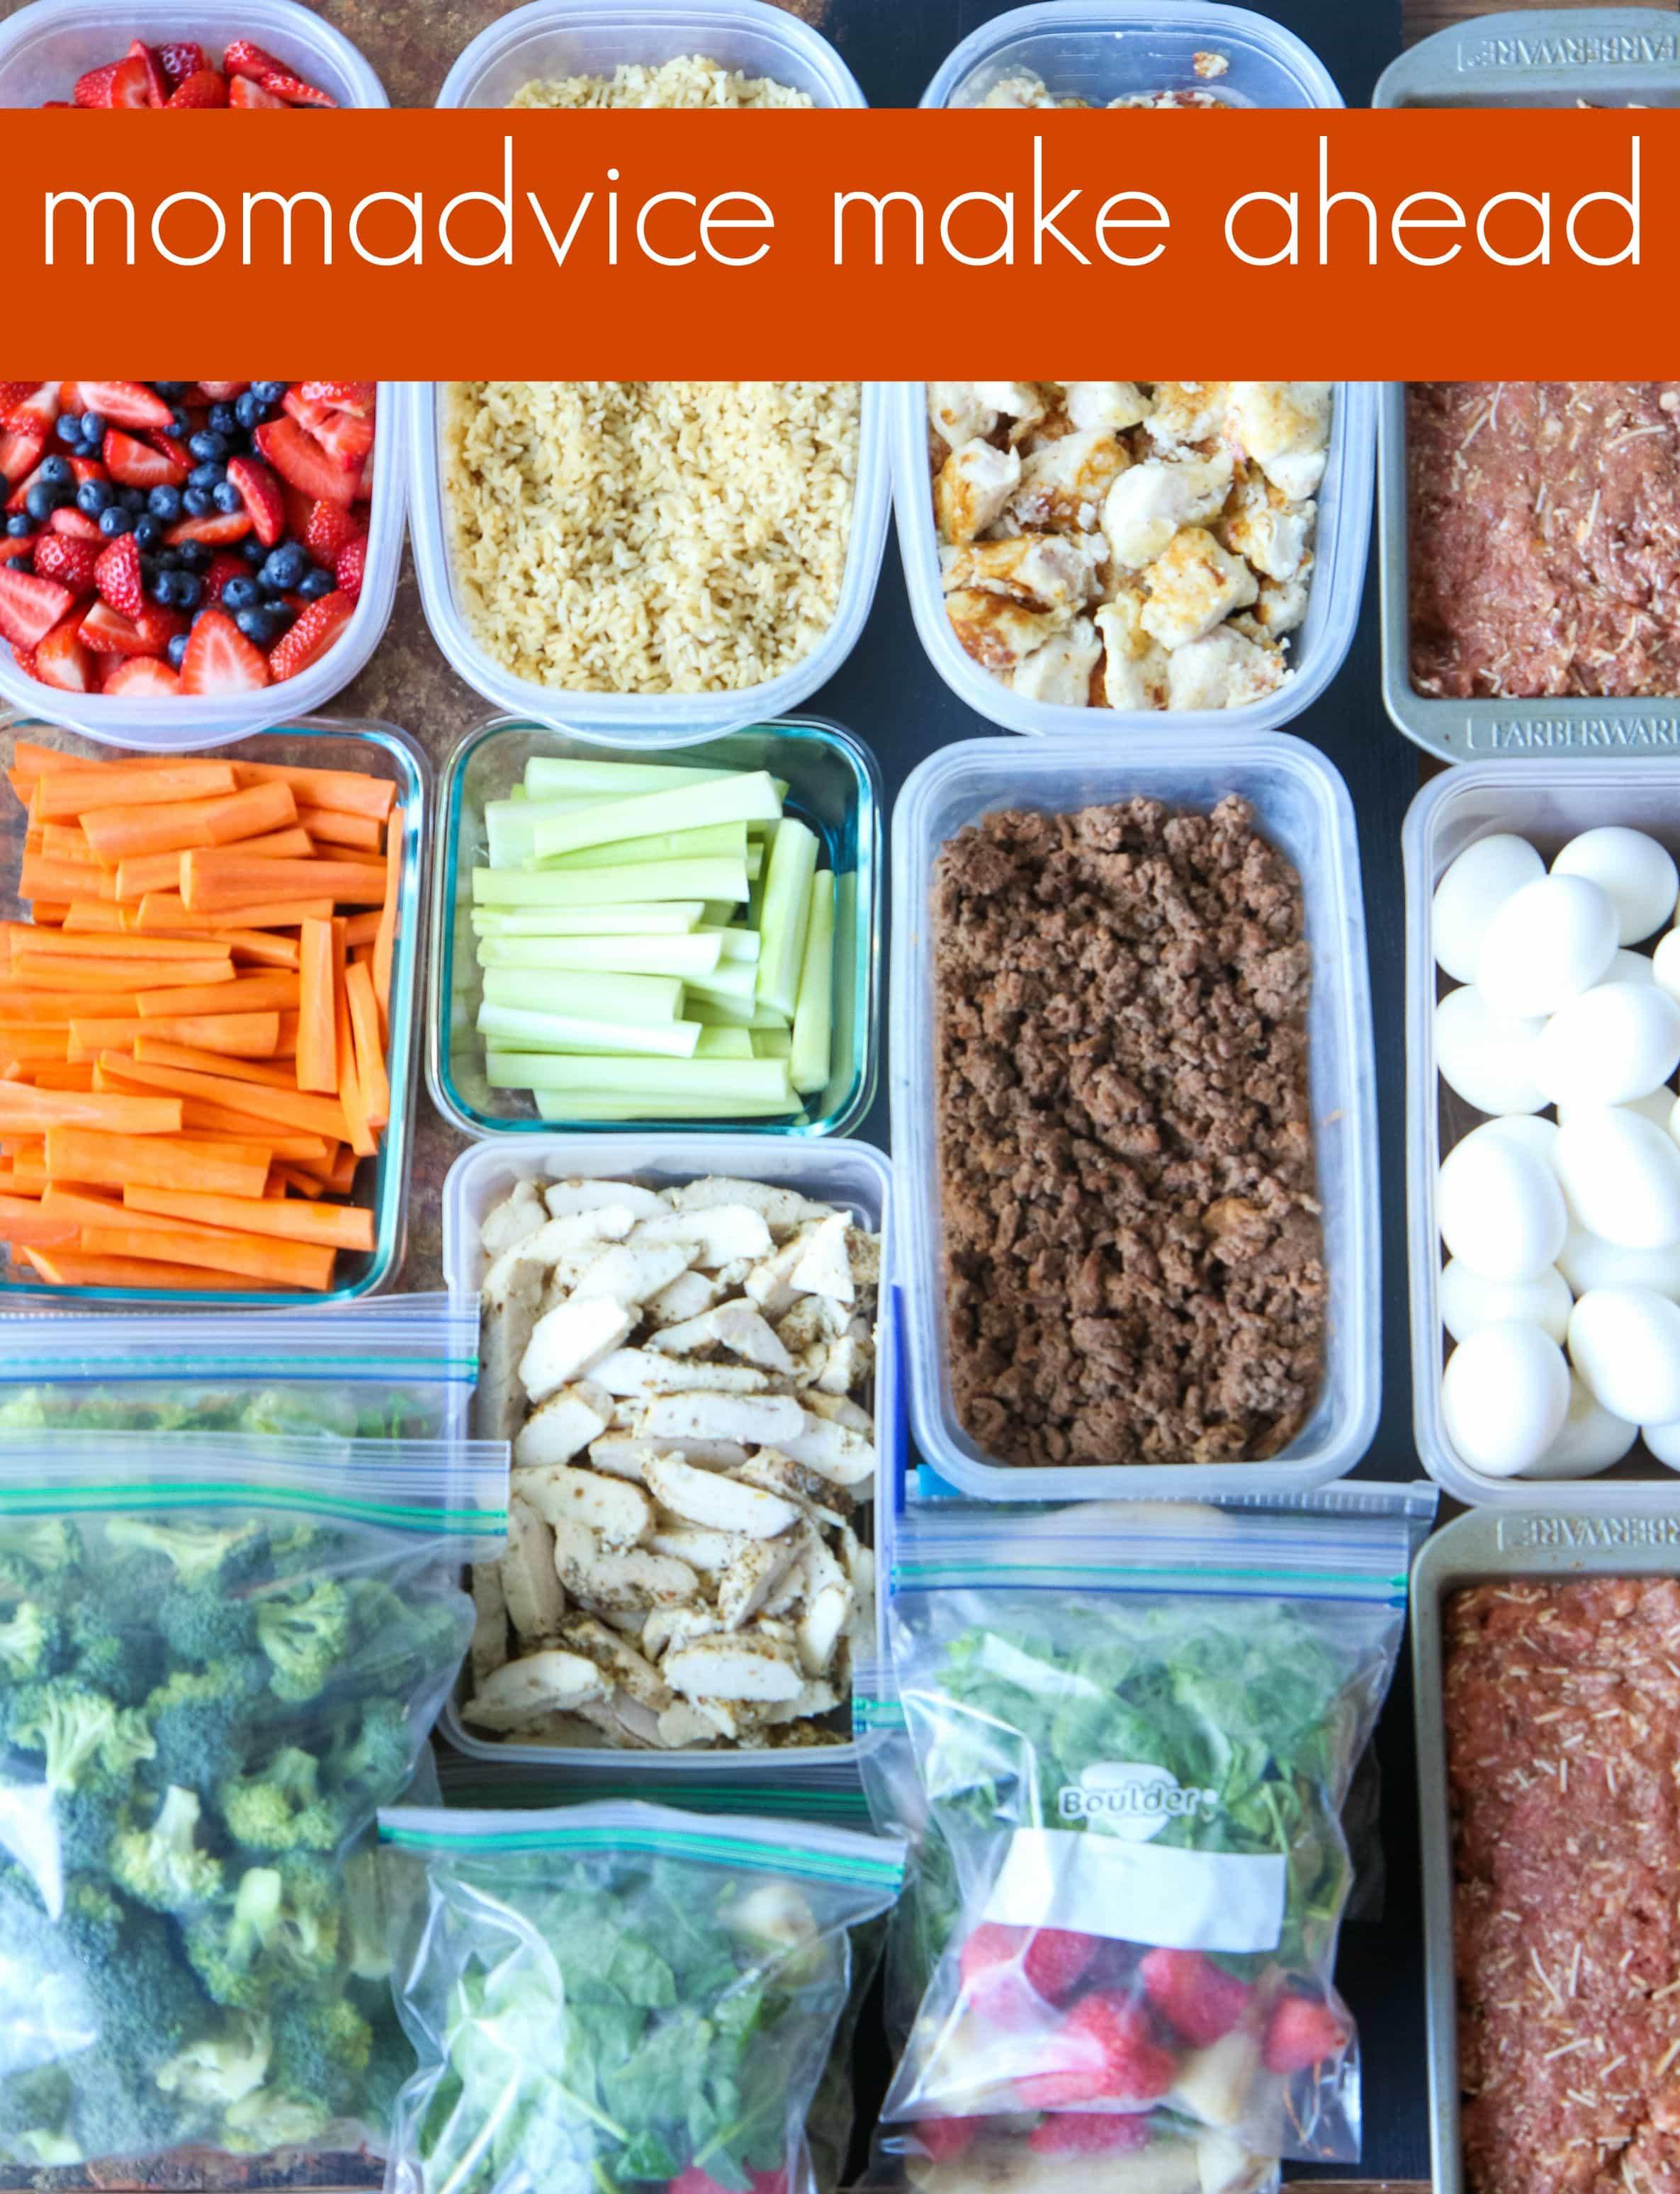 The MomAdvice Make Ahead Meal Ideas